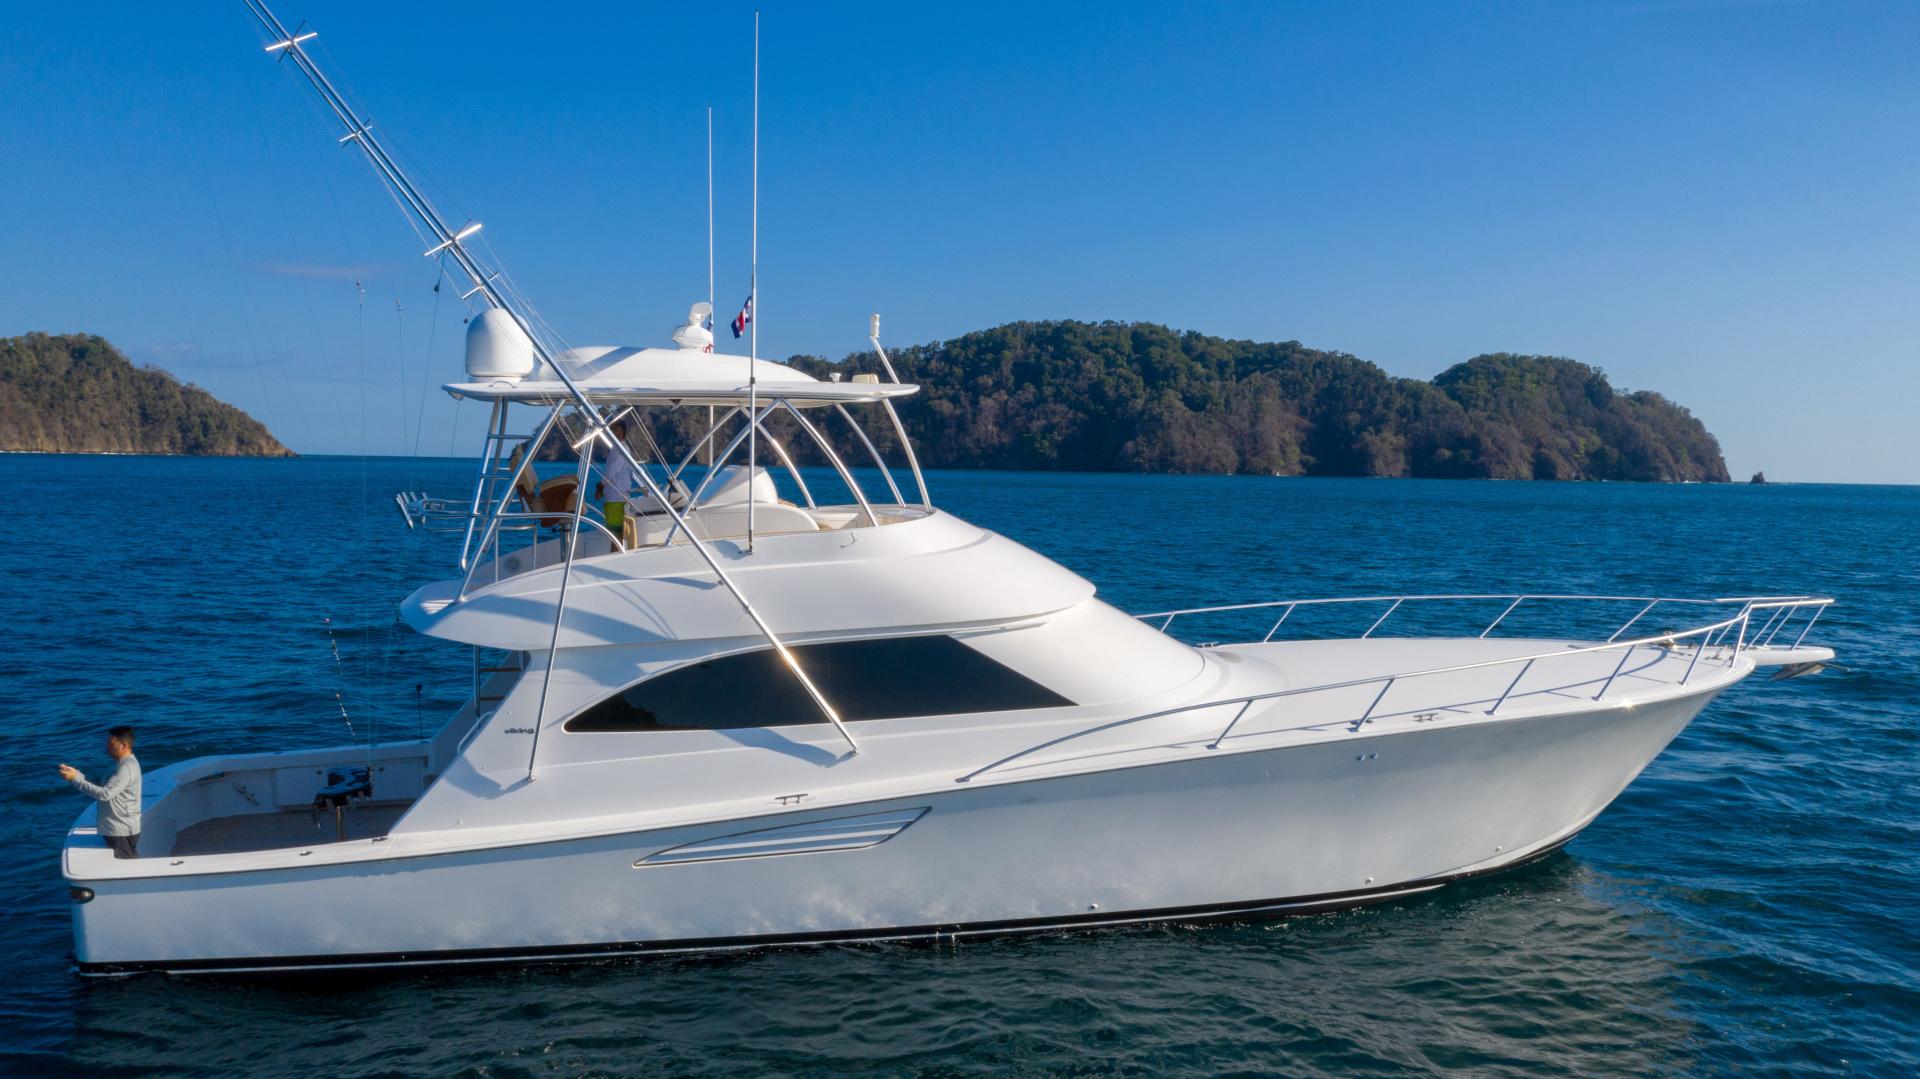 Viking-62 Convertible 2014-Mixer Playa Herradura, Los Suenos,-Costa Rica-2014 Viking 62 Convertible  Starboard Profile-1356277 | Thumbnail